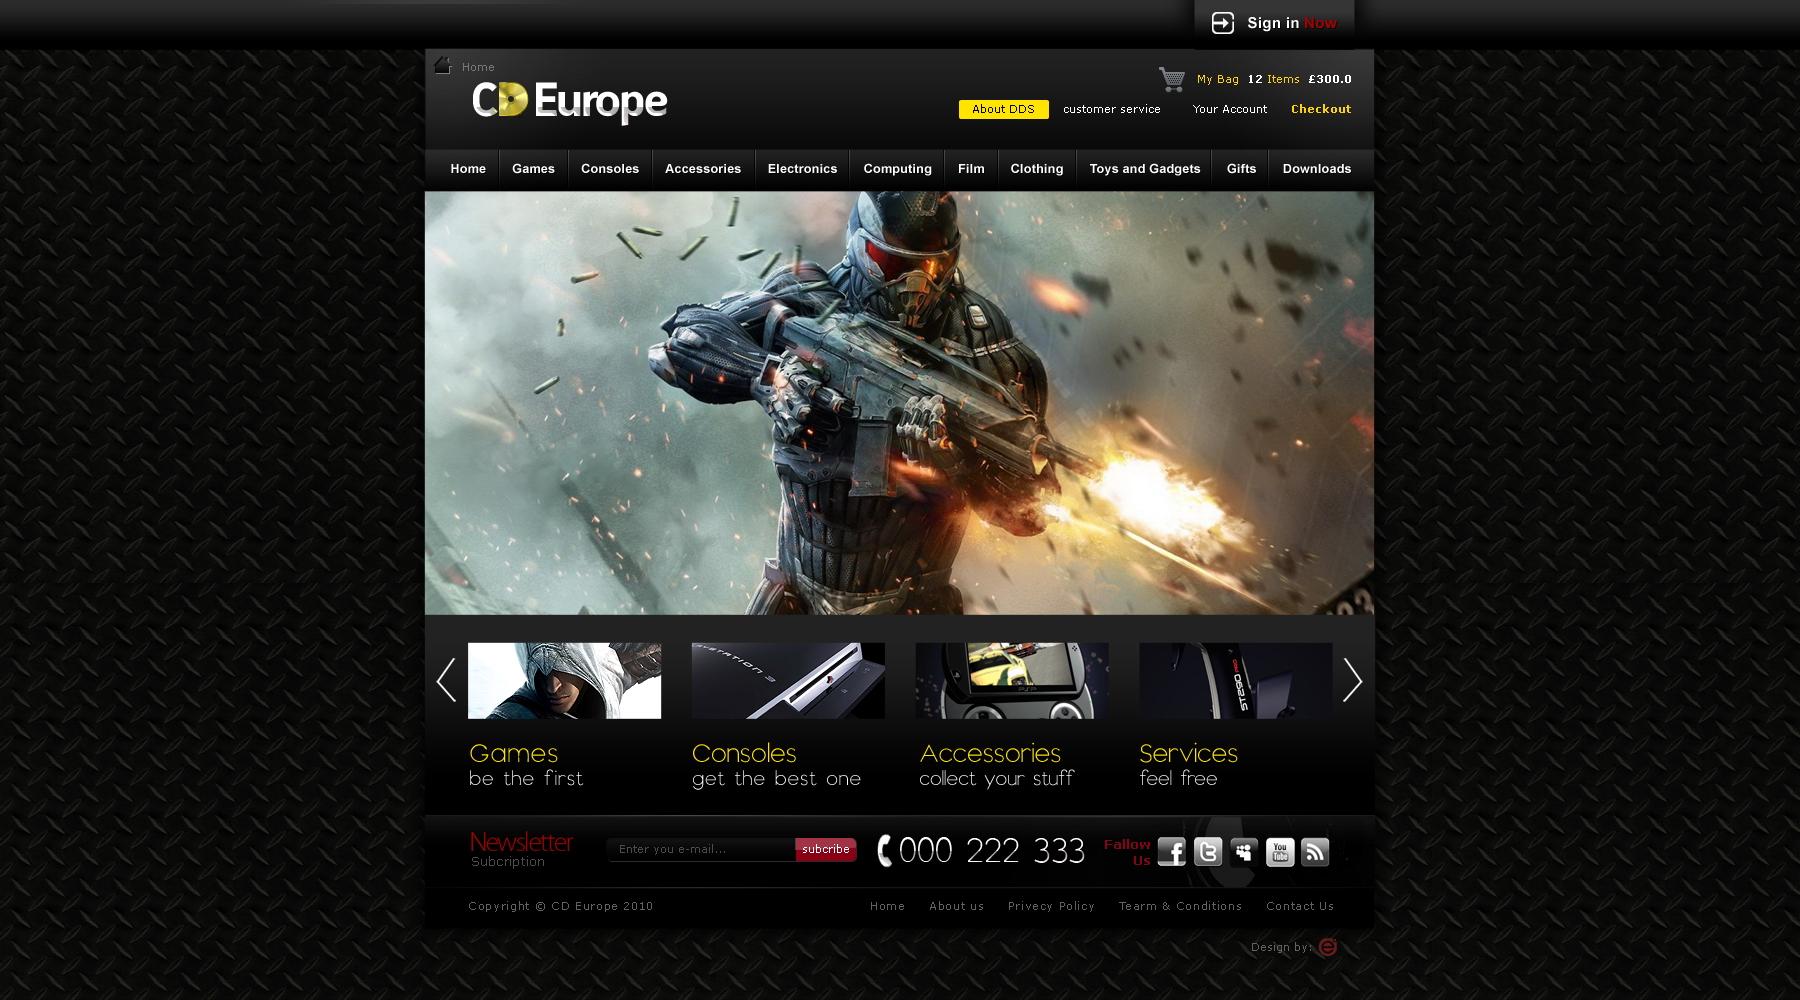 Cd Europe gaming website design by Dexign-Oxigen on DeviantArt